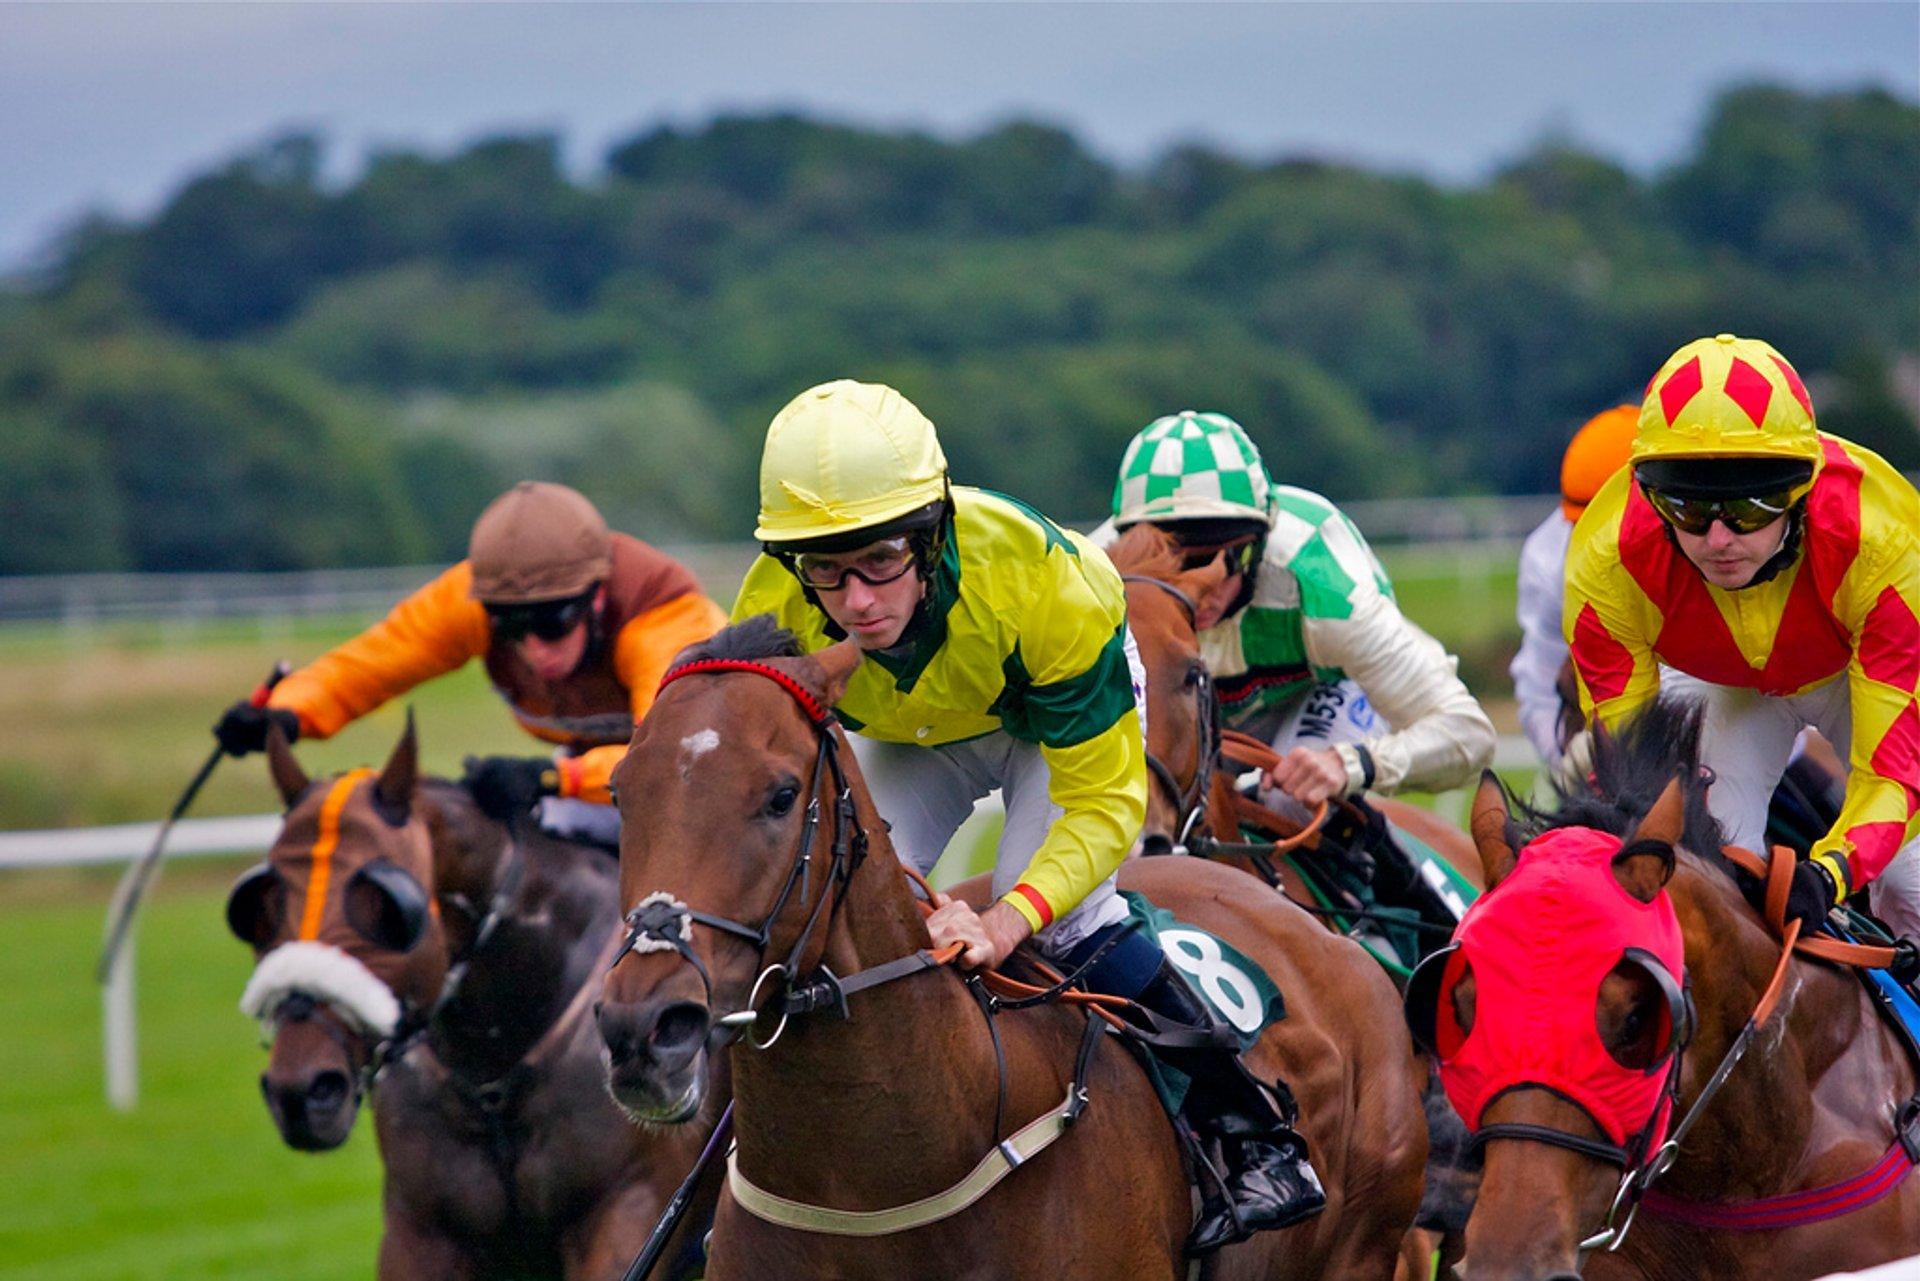 Horse Flat Racing Season in Edinburgh 2020 - Best Time